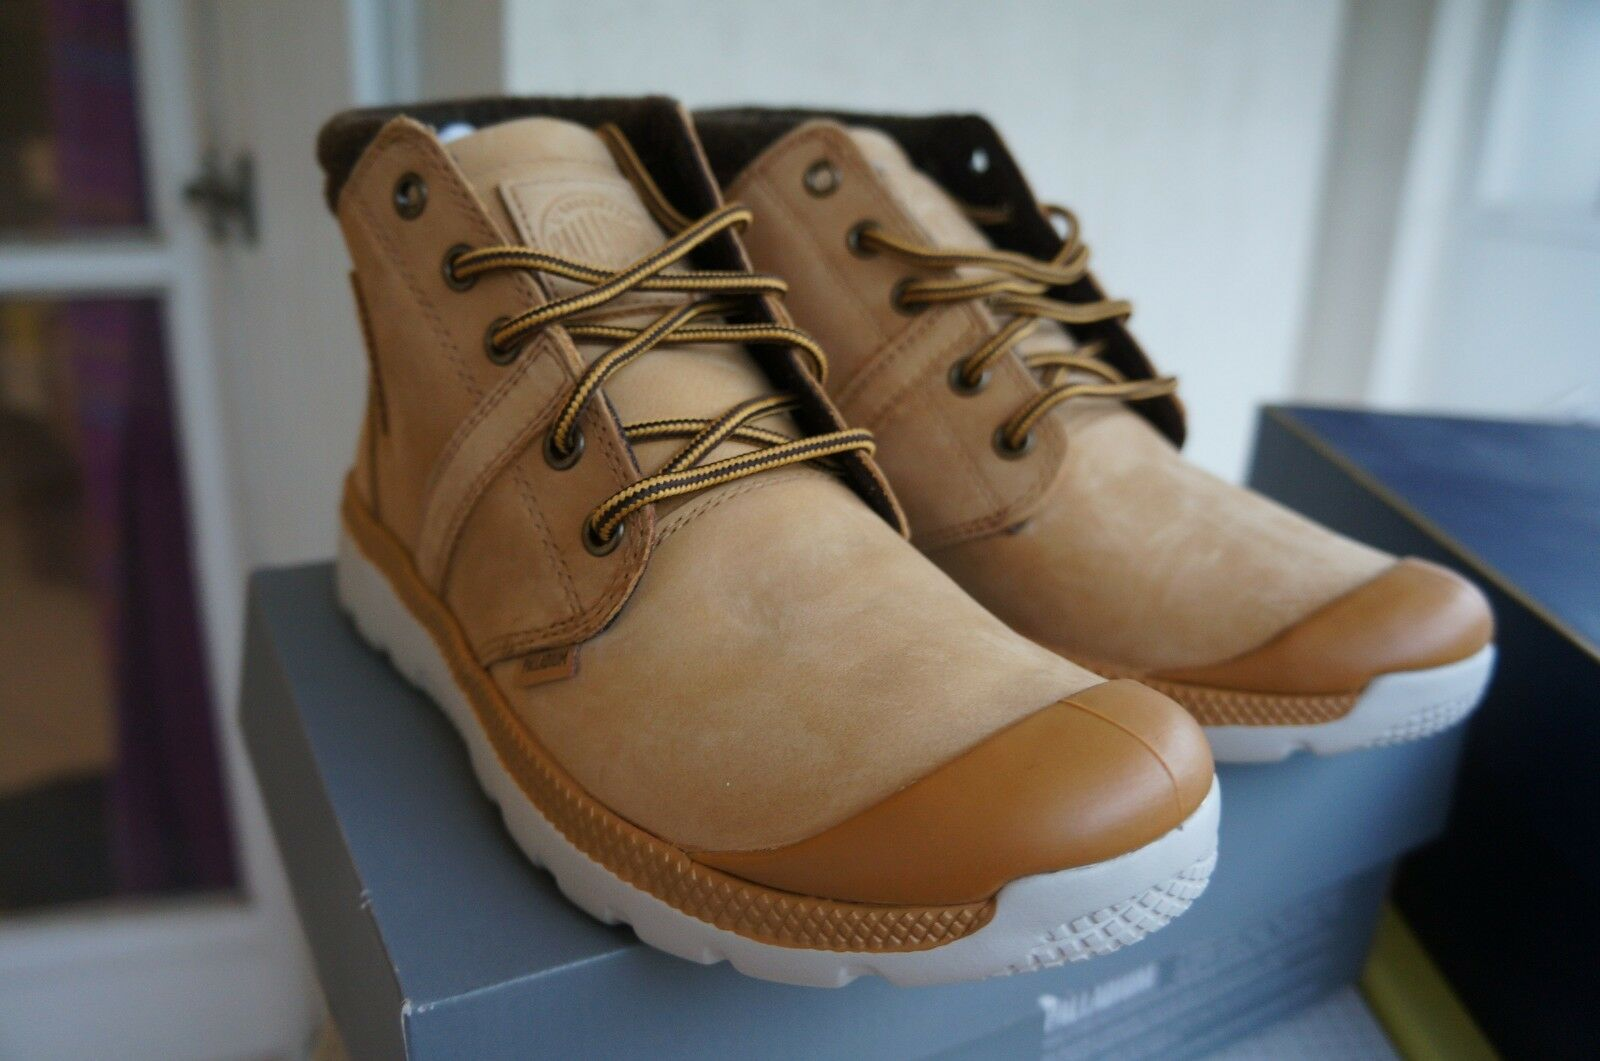 Palladium Palavil D Cuf F, Sneakers Hautes women, yellow 39 EU